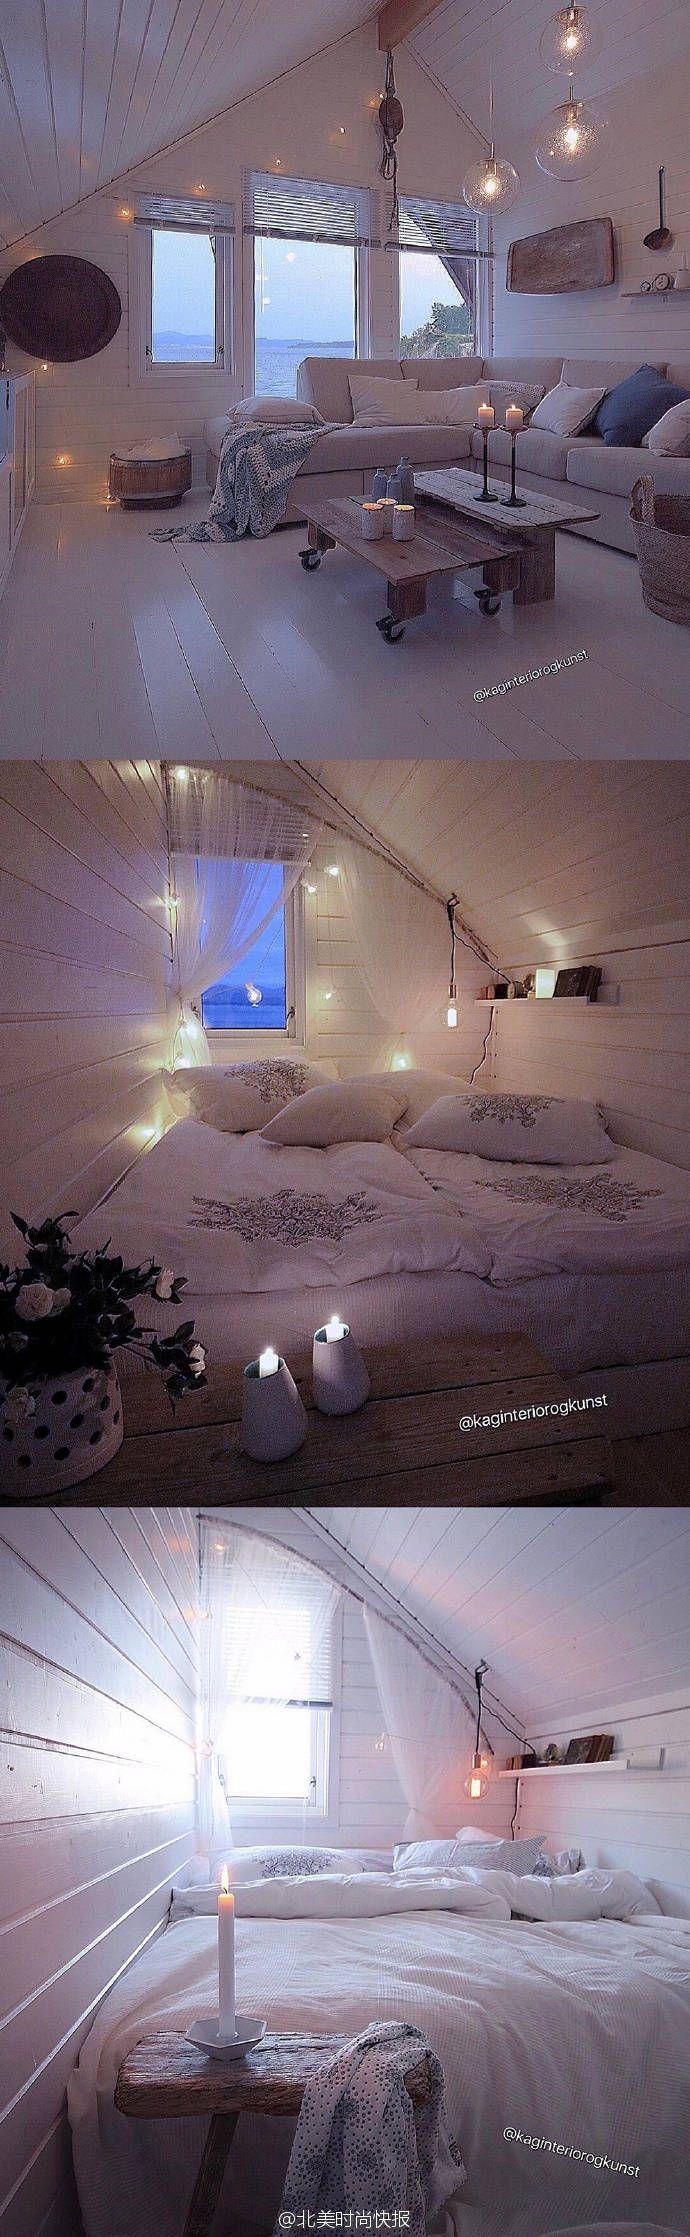 Dream little dream of me